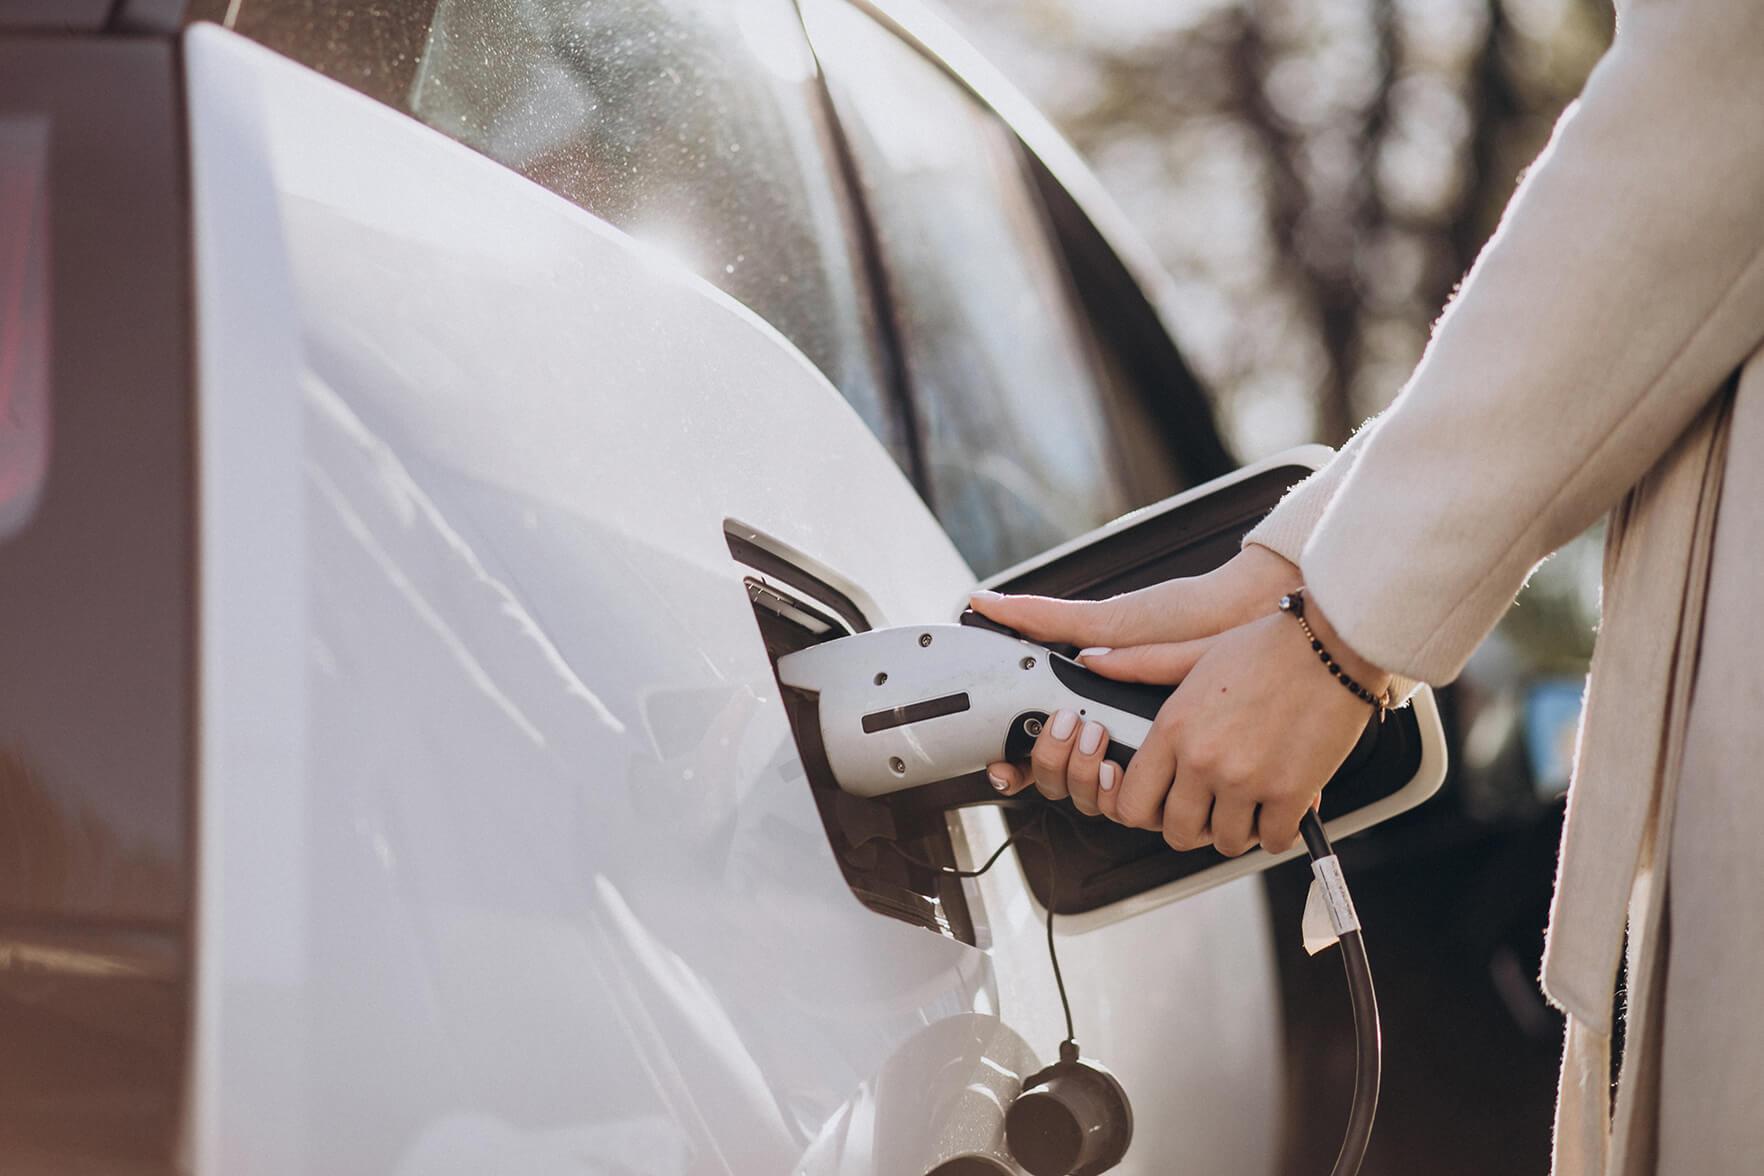 charger-charging-electro-car-close-up (1).jpg